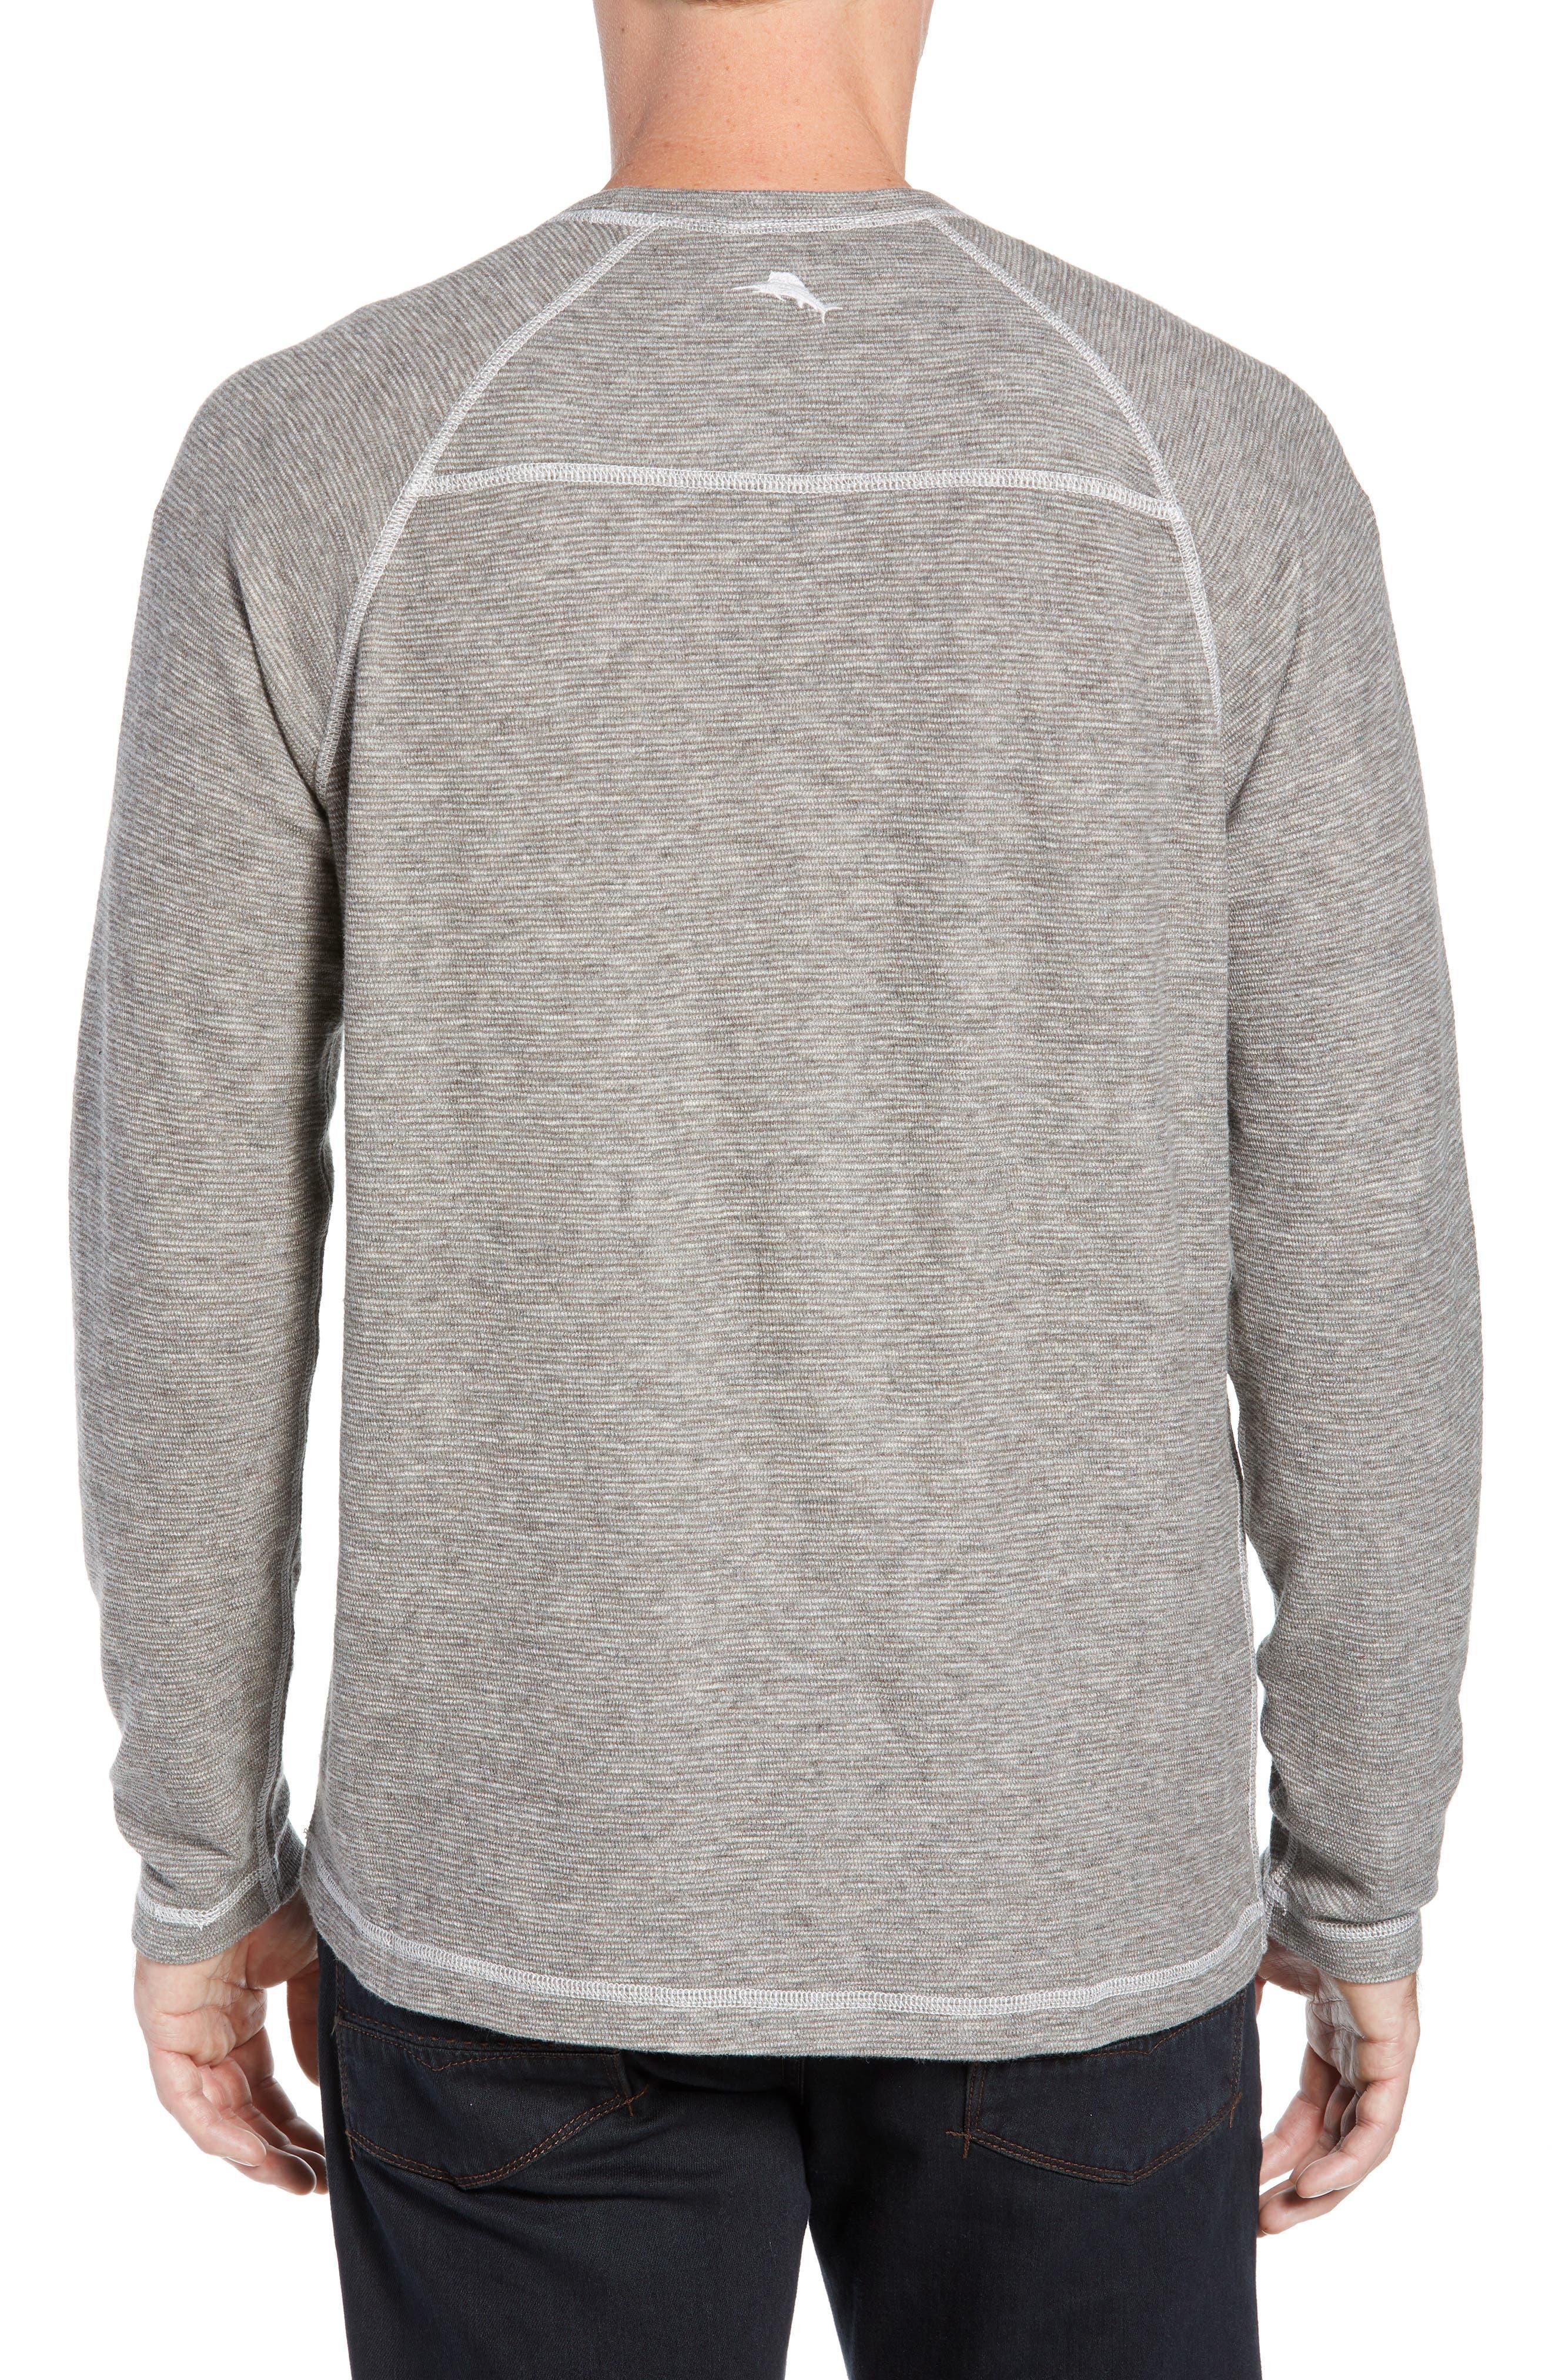 Fortuna Flip Regular Fit Shirt,                             Alternate thumbnail 3, color,                             TAUPE HEATHER